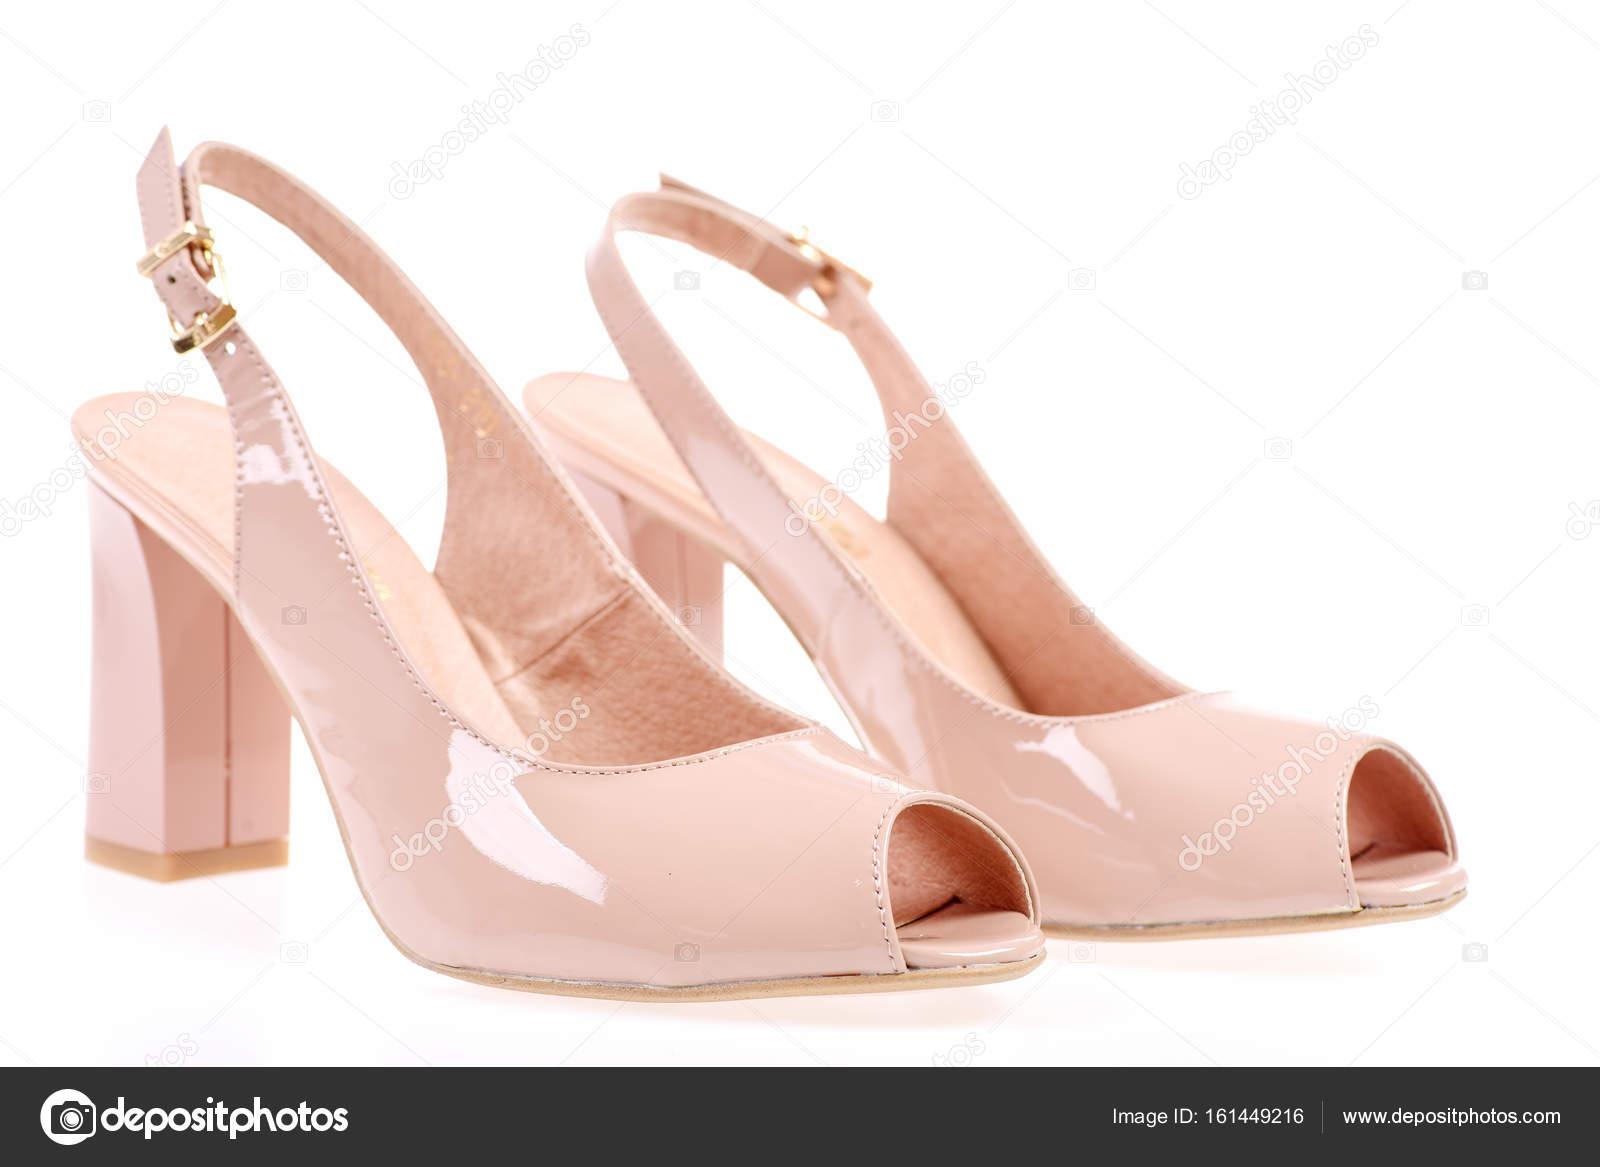 cdd66bb971a Γυναικεία σανδάλια που απομονώνονται σε λευκό φόντο. Ζευγάρι παπούτσια σε  ροζ χρώμα. Καλοκαιρινά αξεσουάρ: ψηλοτάκουνα πέδιλα. Γυναικεία δερμάτινα  υποδήματα ...